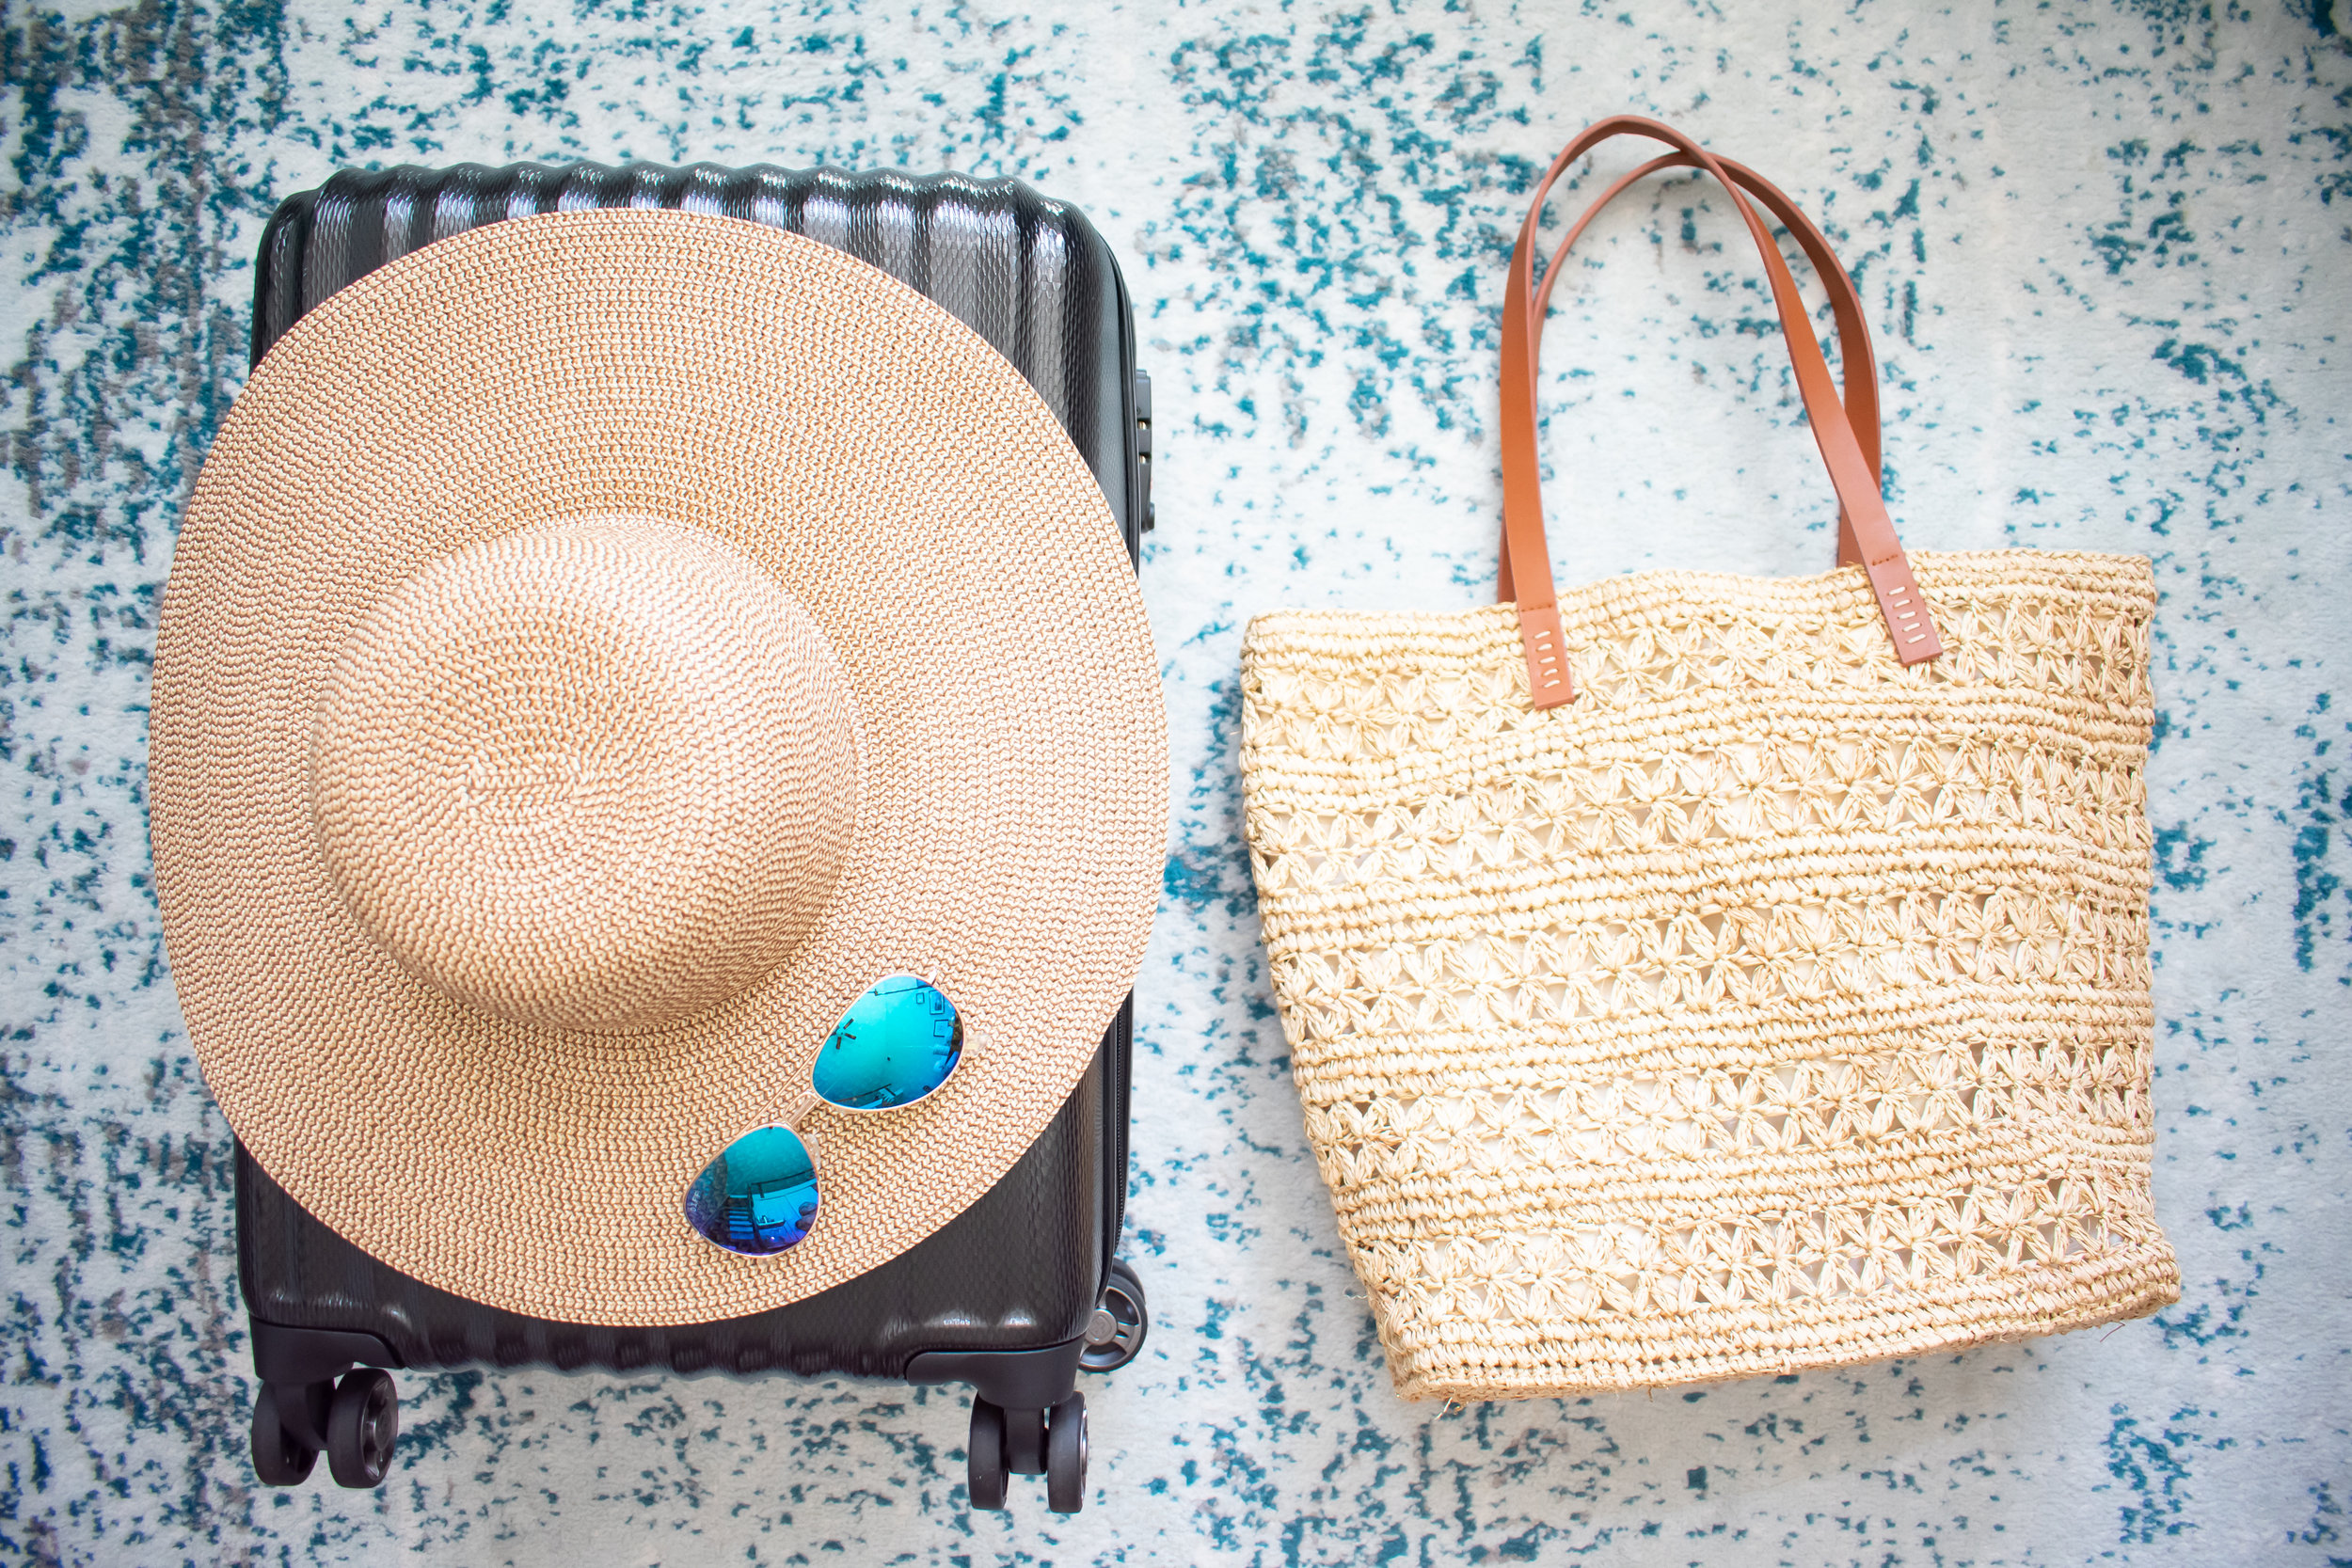 Punta Cana - bags ppacked-9.jpg